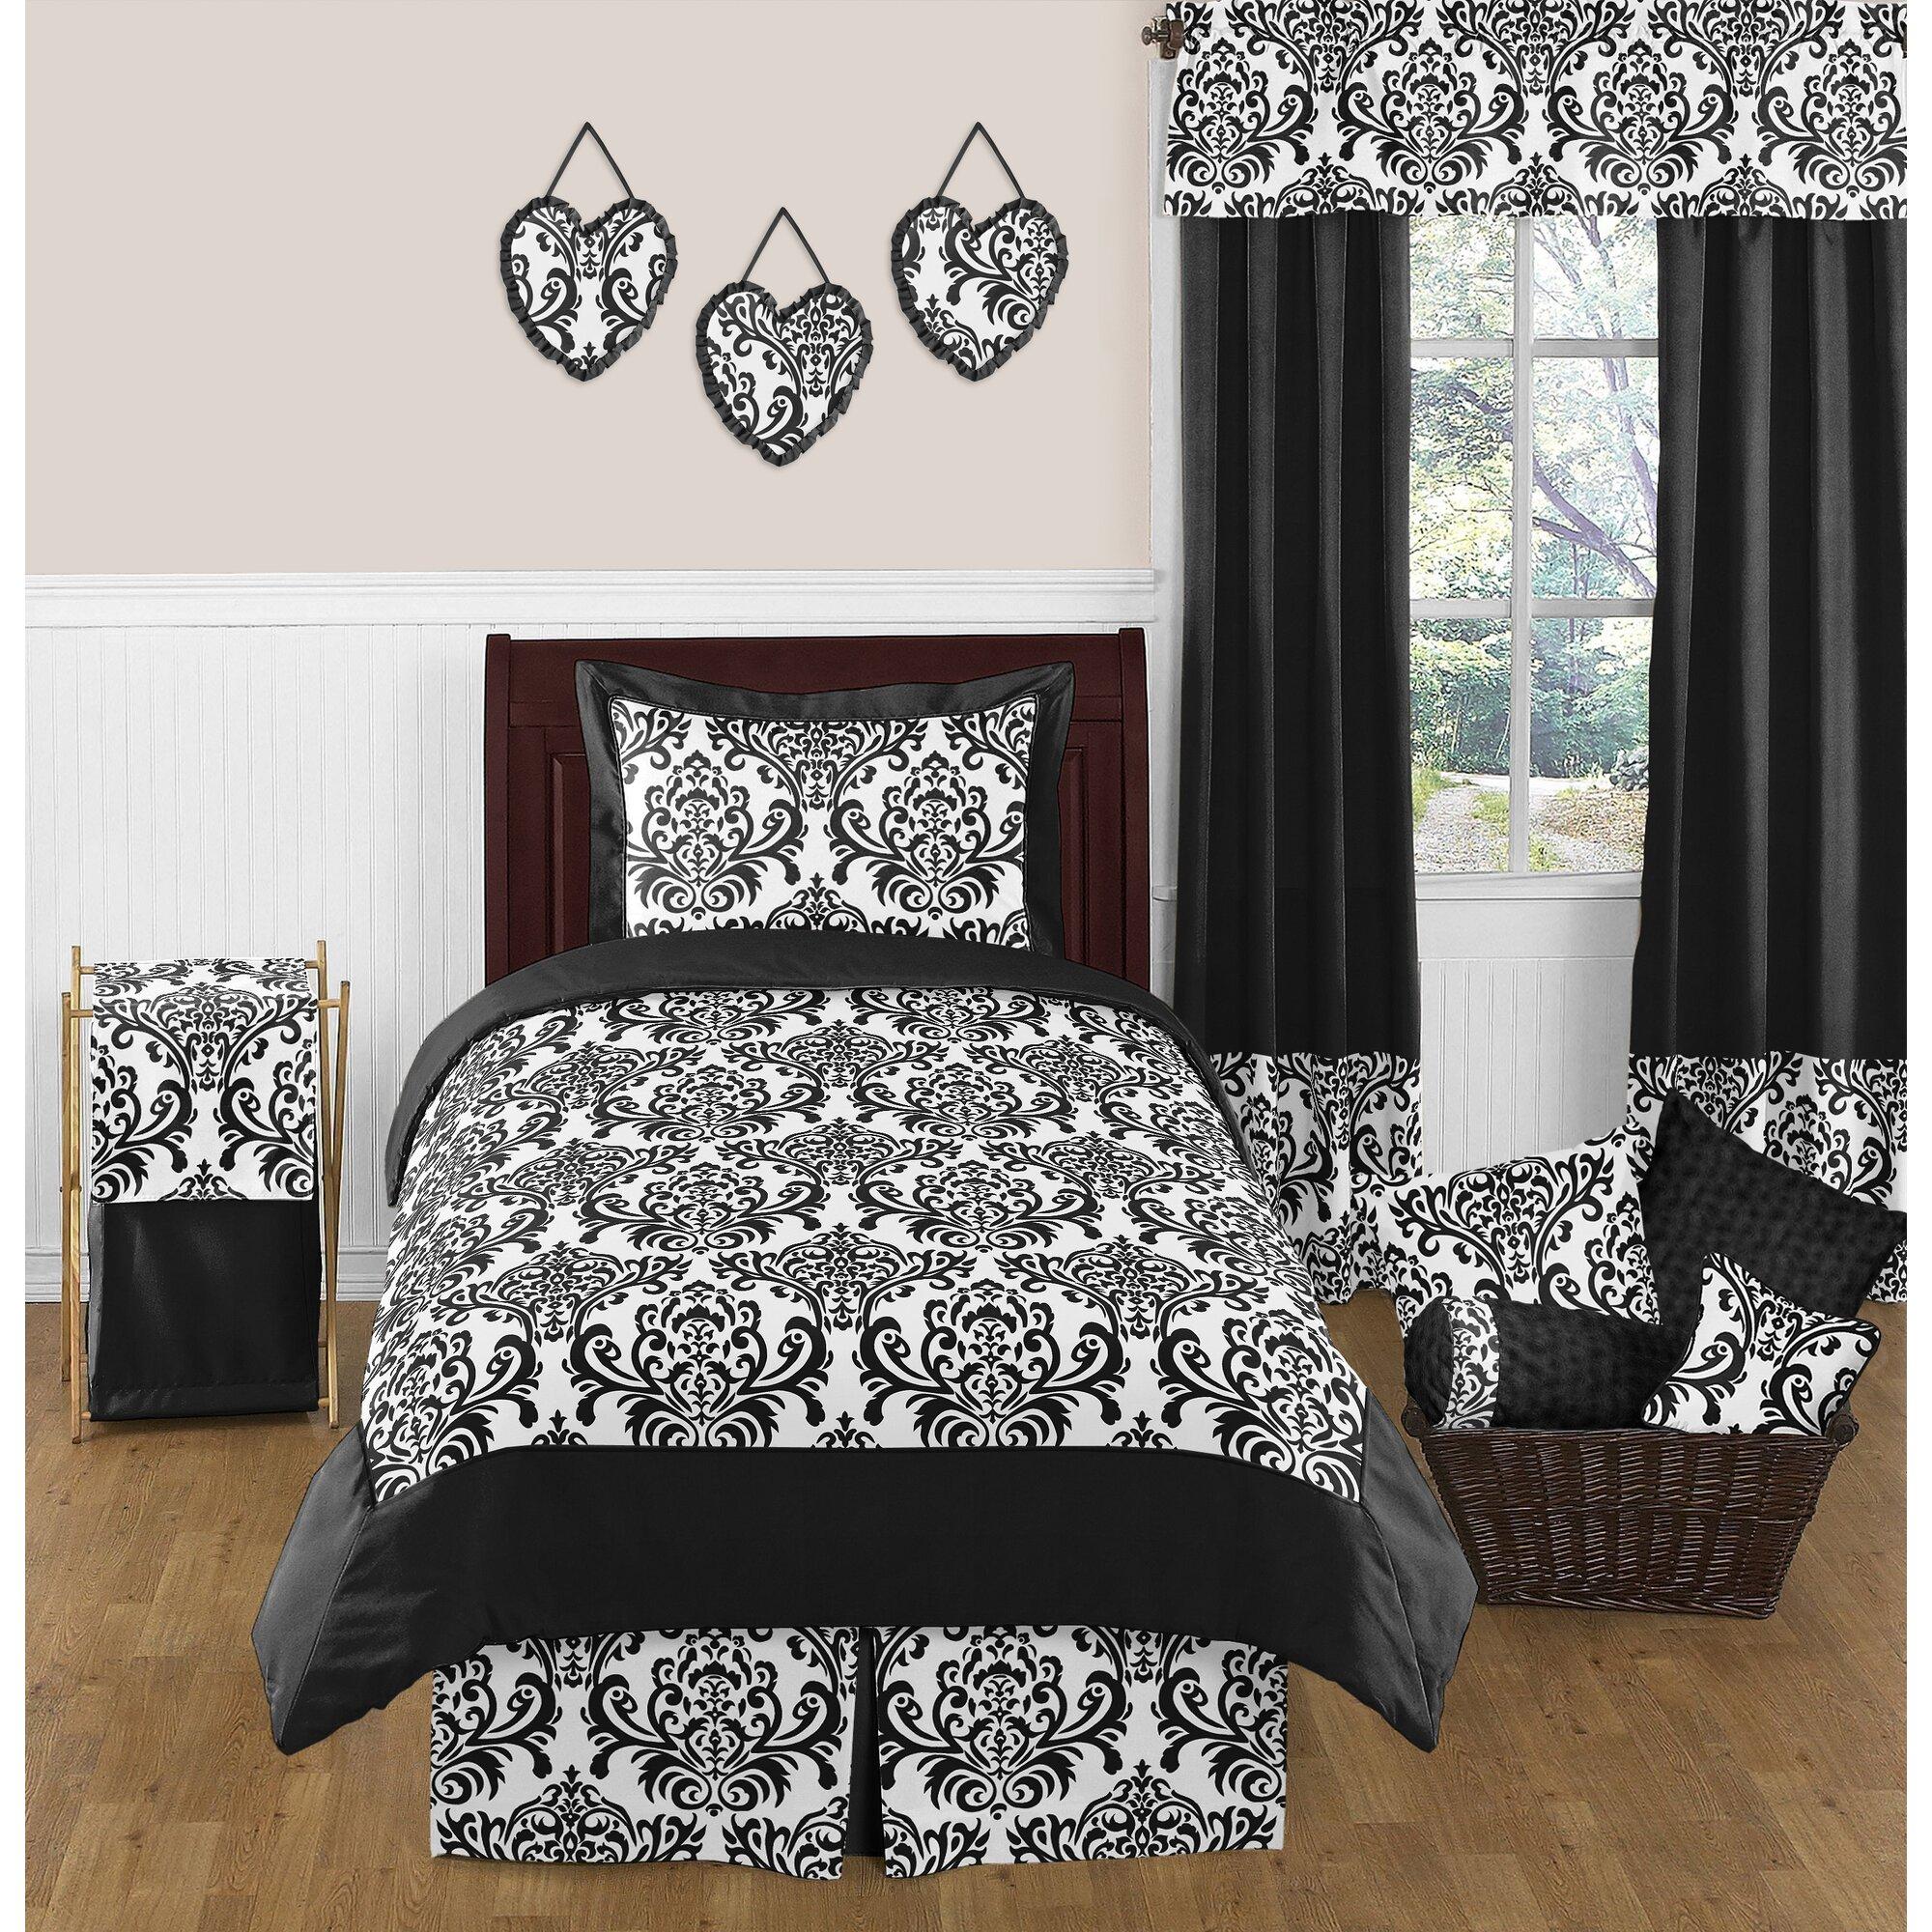 Jojo luxury black white damask girl kids teen full queen sized bedding - Isabella 4 Piece Twin Comforter Set